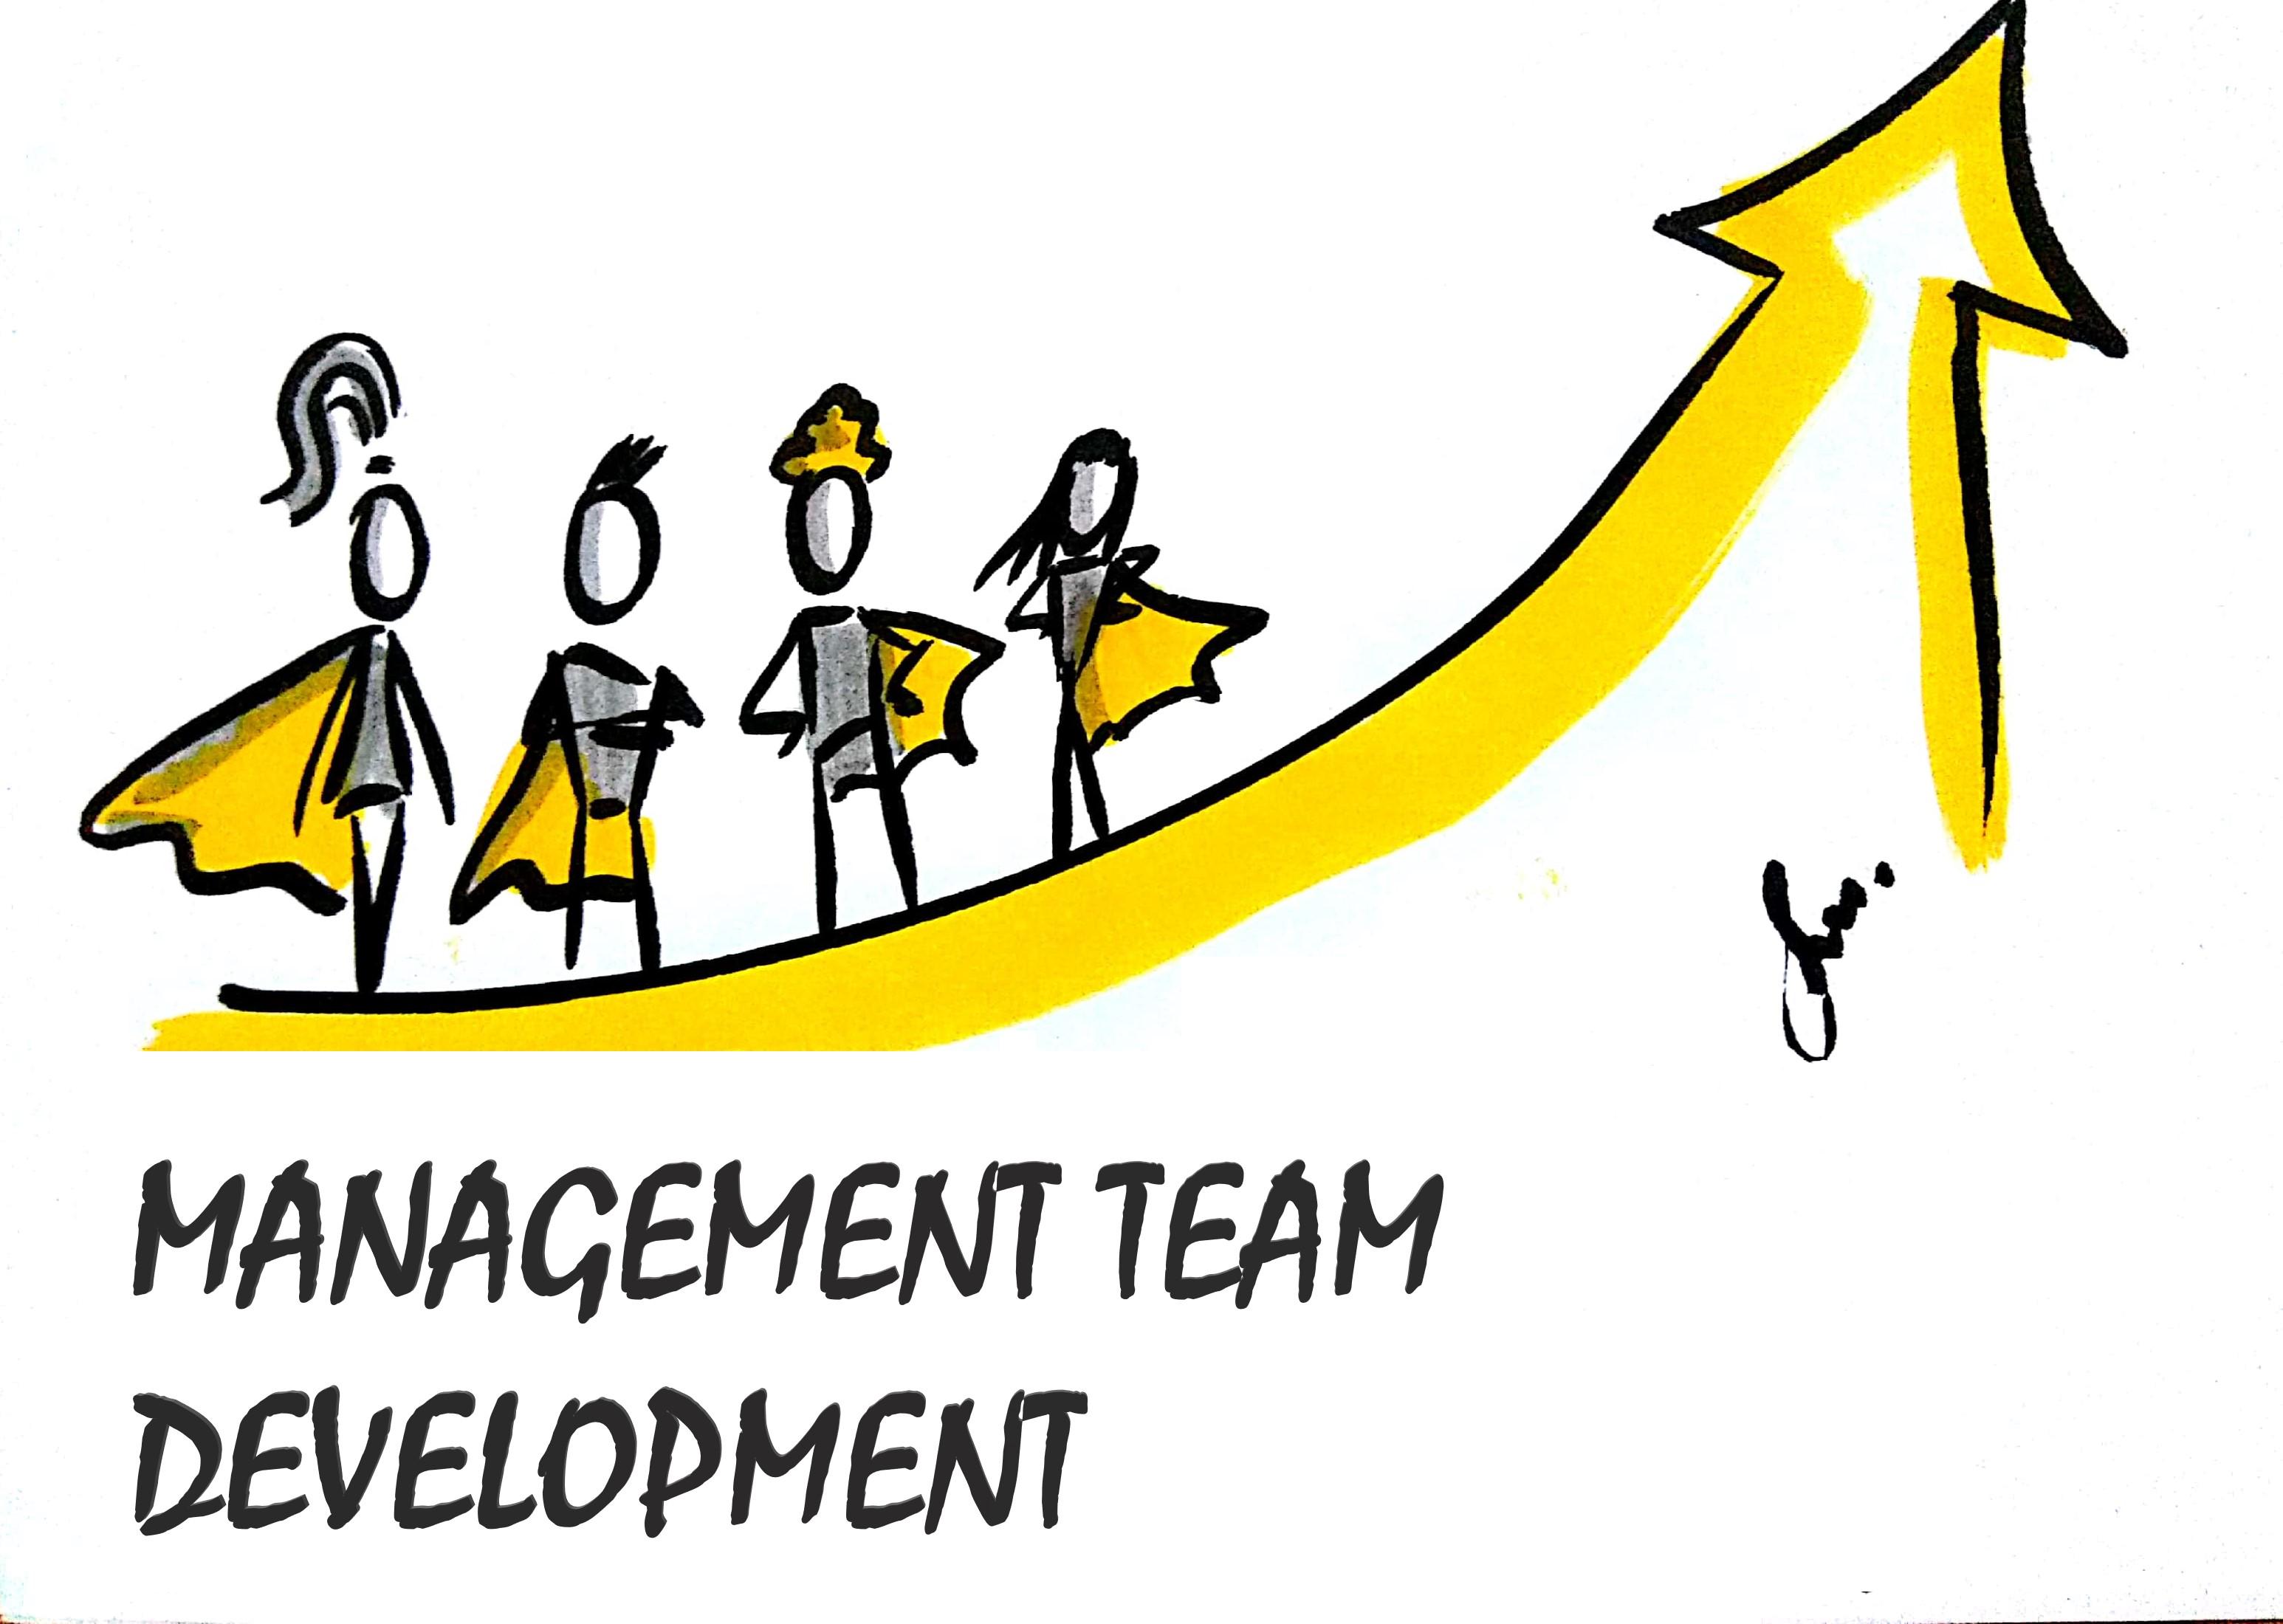 Management Team Development